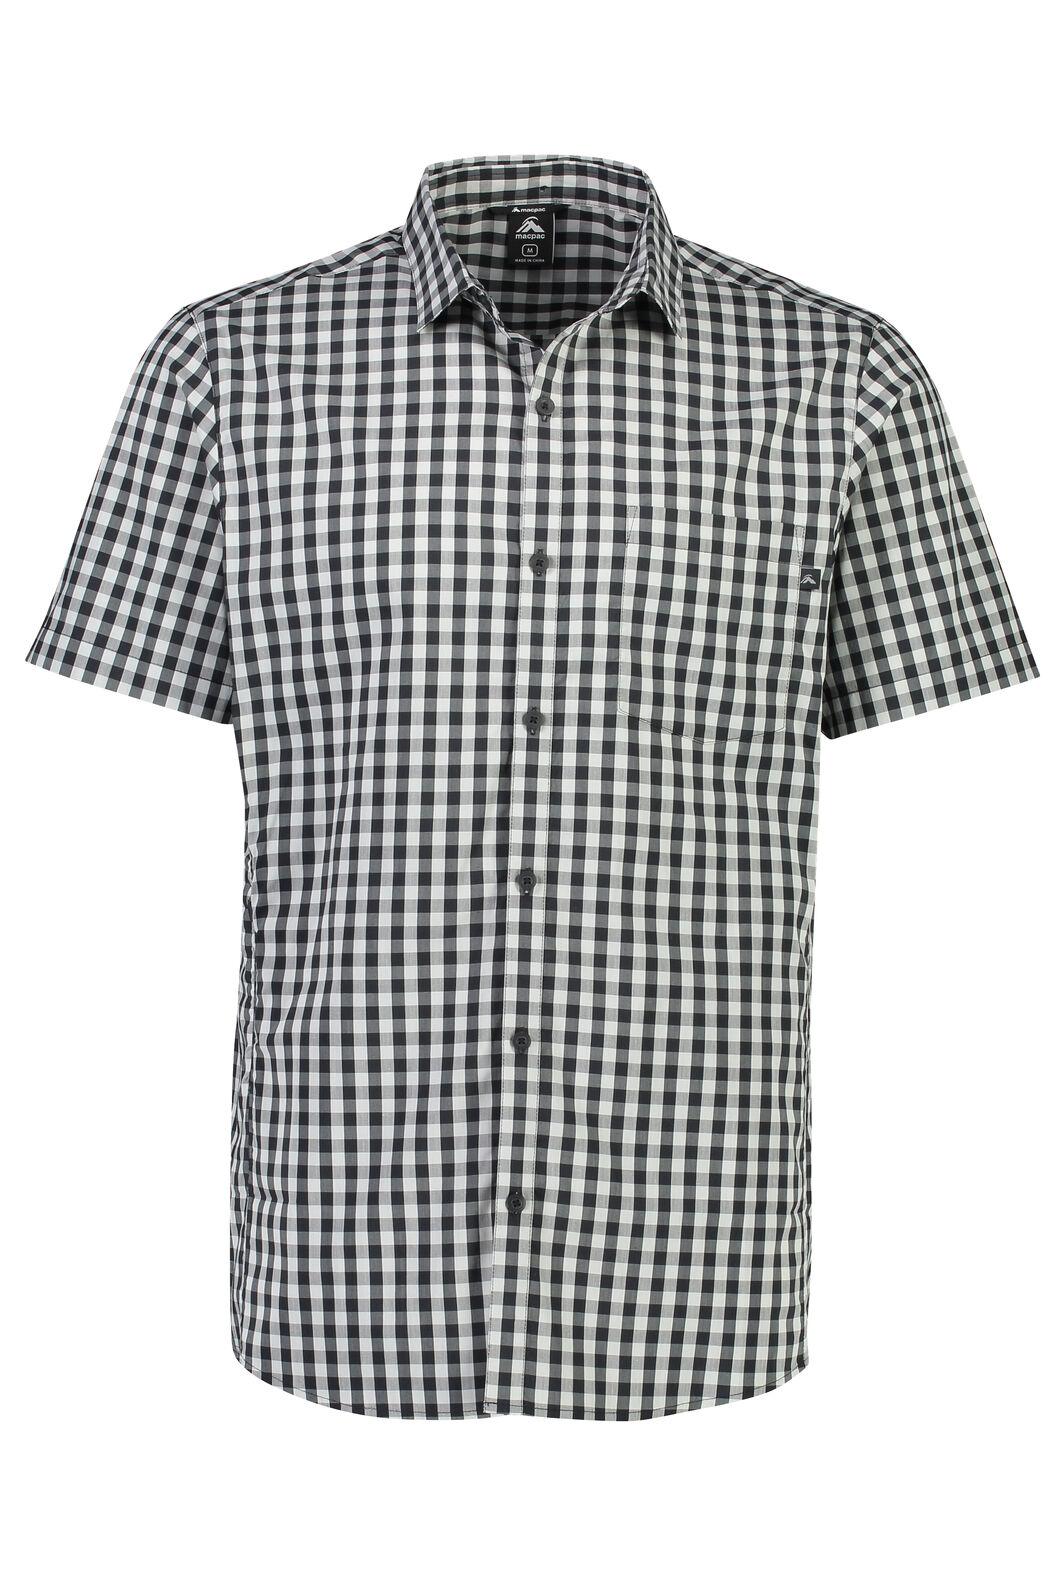 Macpac Crossroad Short Sleeve Shirt - Men's, Anthracite, hi-res